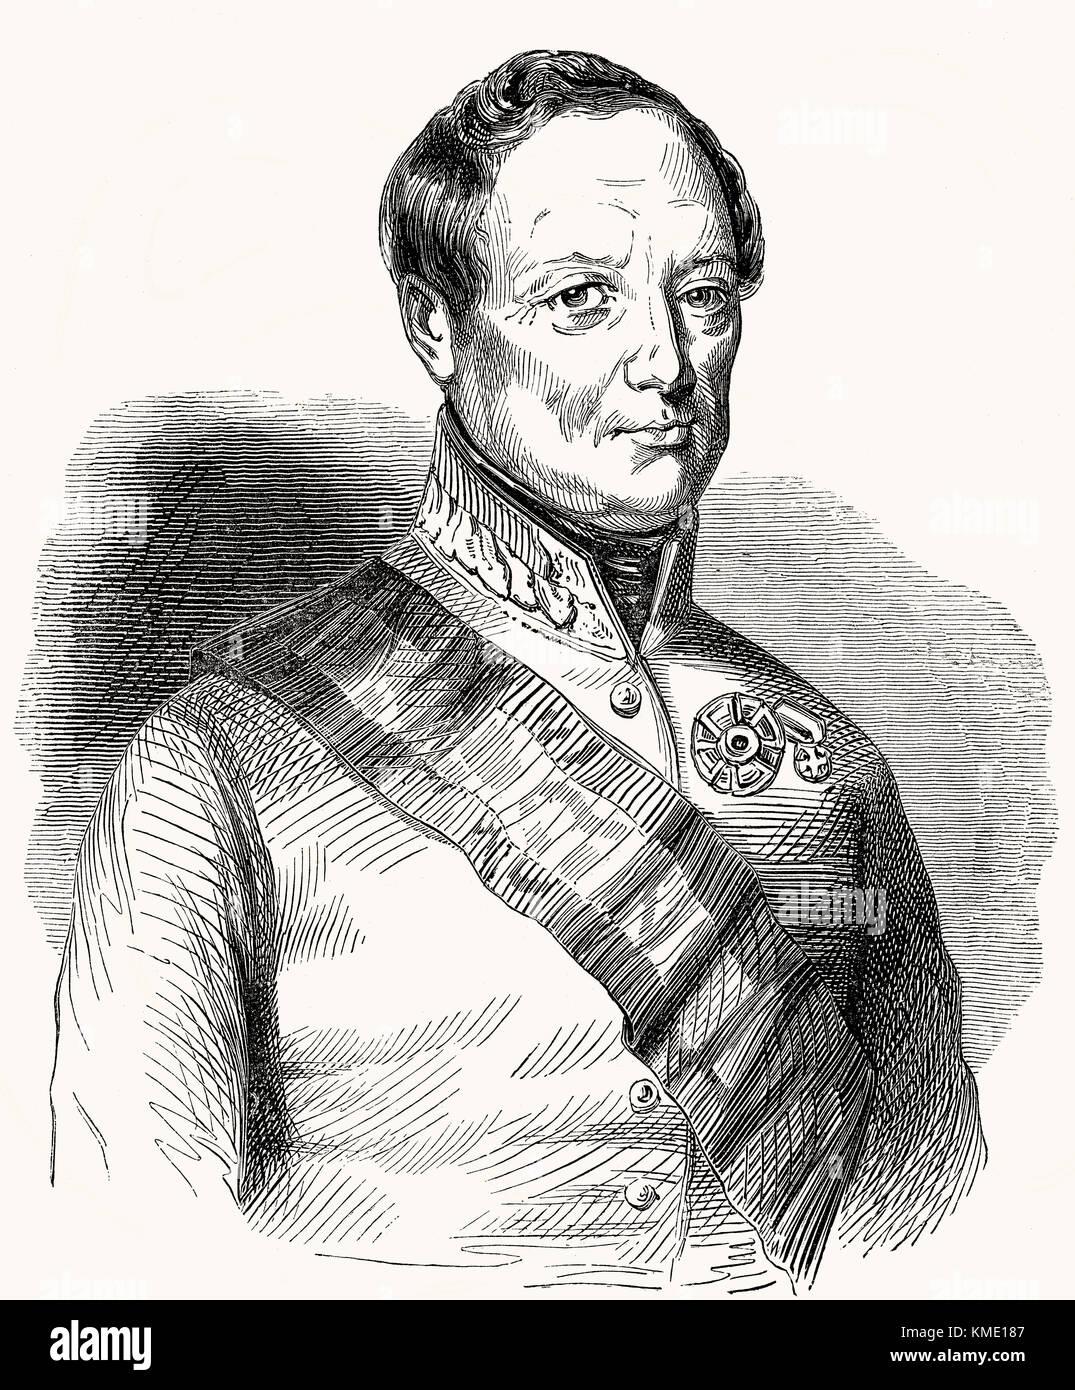 John Joseph Wenceslaus, Count Radetzky of Radetz, 1766 - 1858, a Czech nobleman and Austrian general - Stock Image